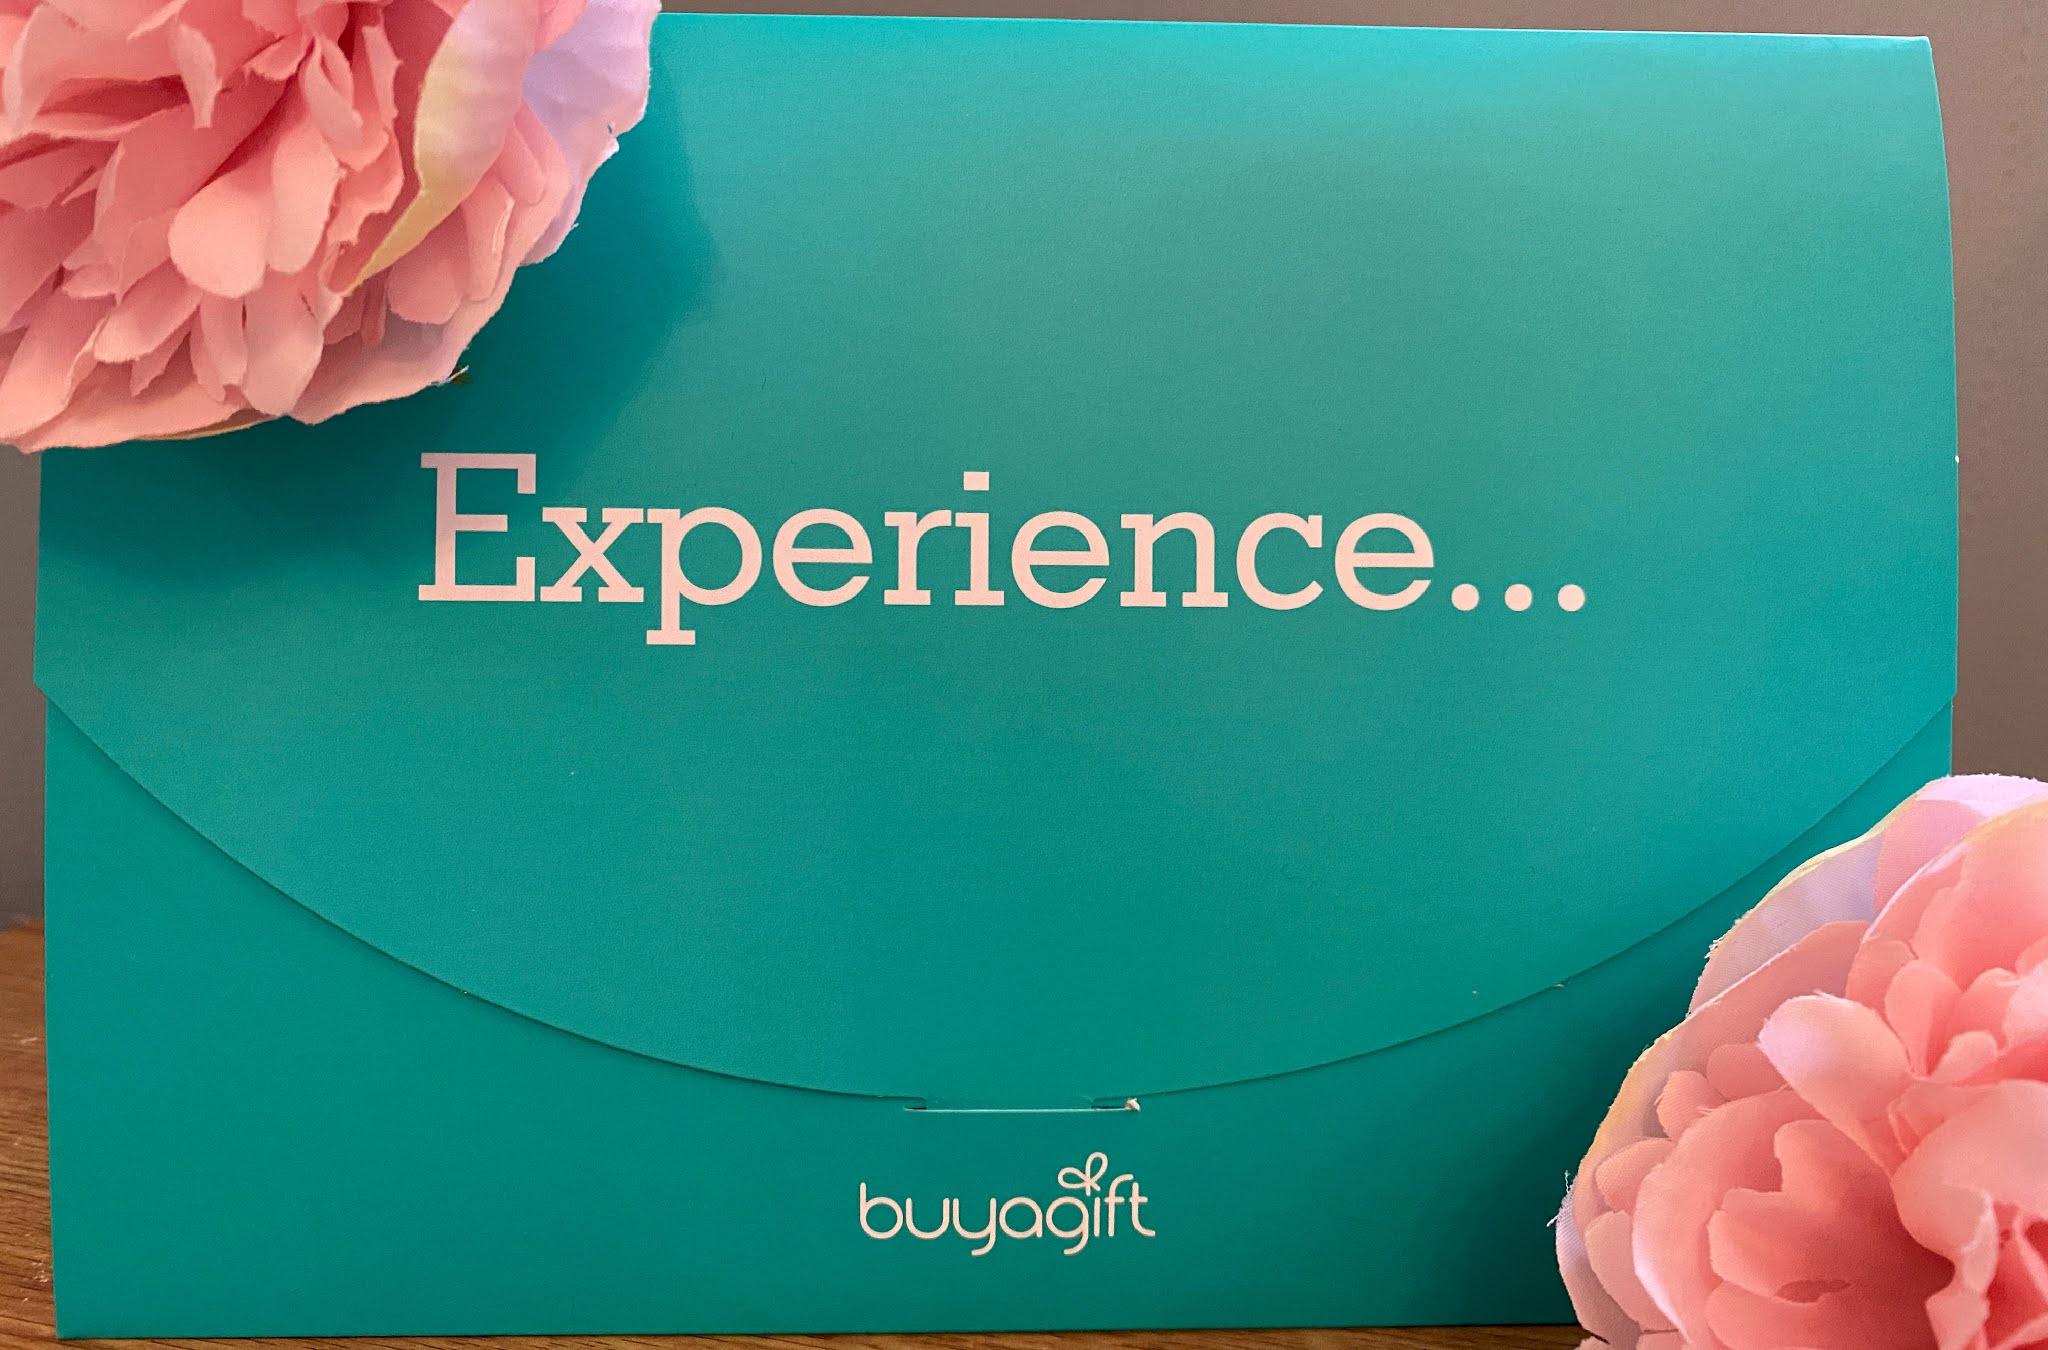 Buyagift Experience